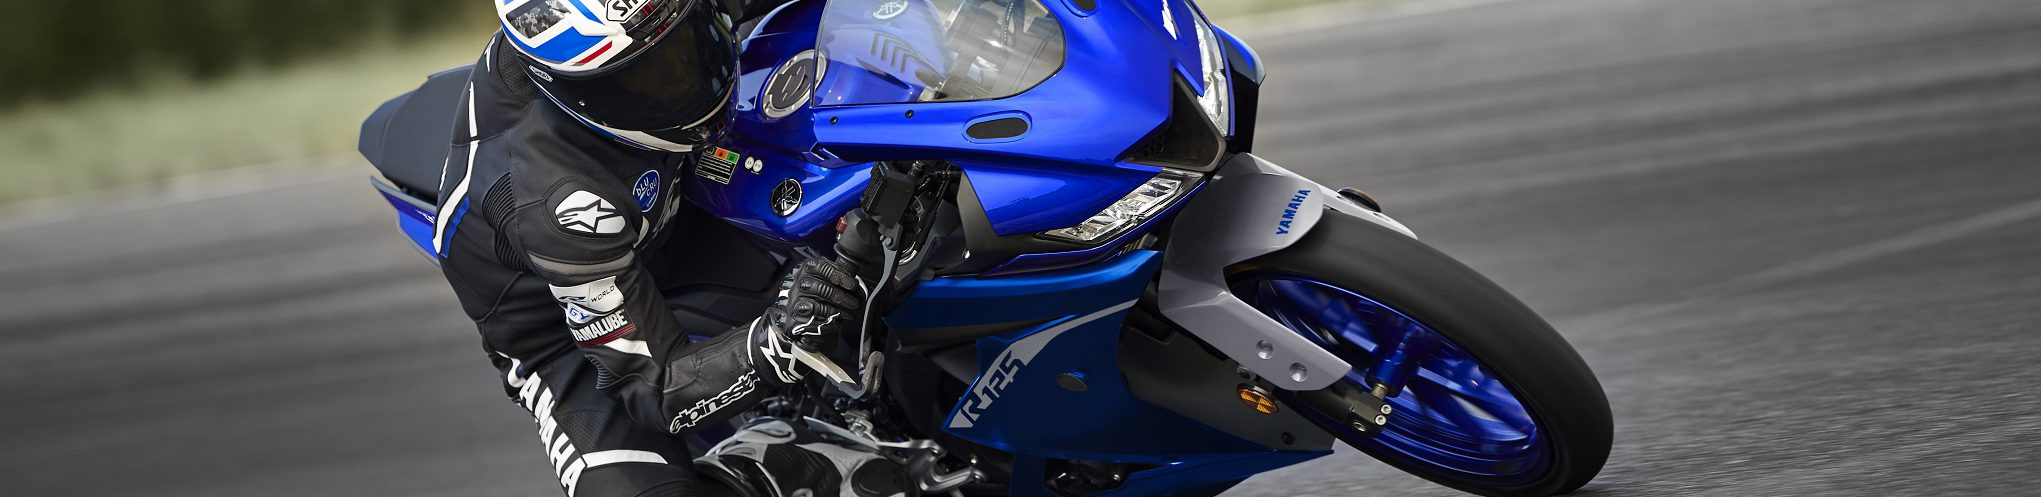 Yamaha YZF-R125   MotorCentrumWest